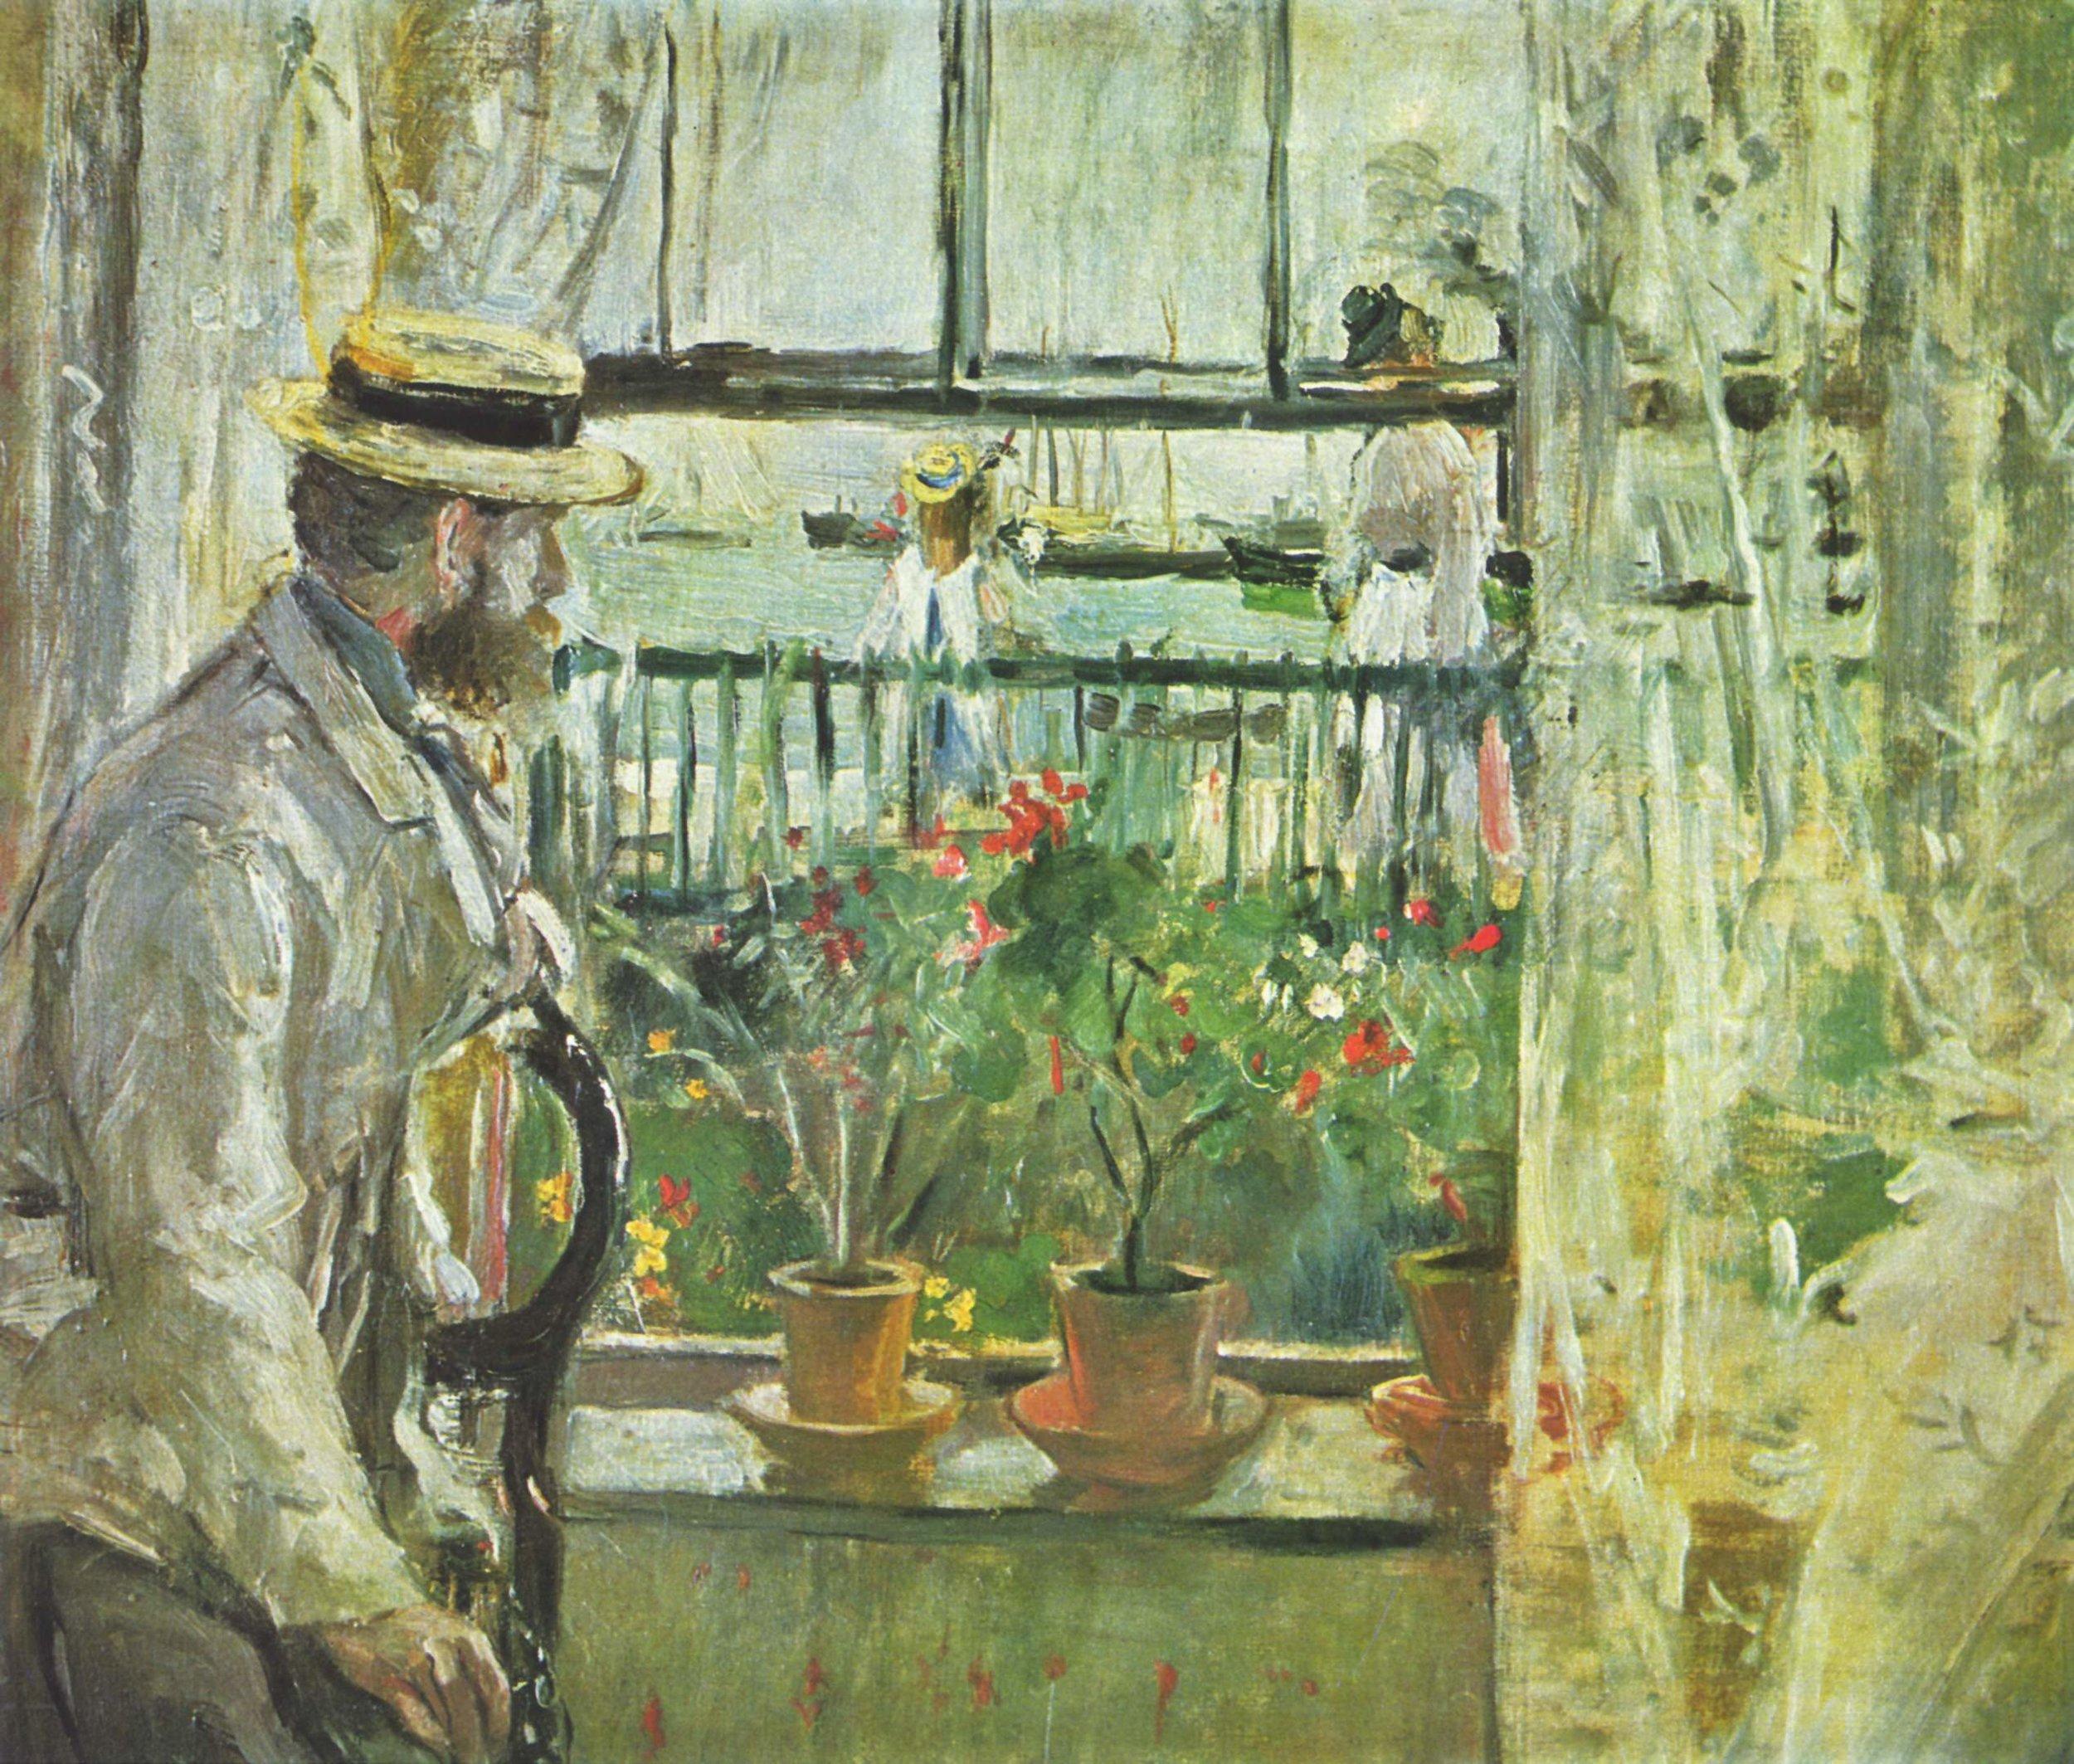 Berthe Morisot, Eugene Manet on the Isle of Wight, 1875